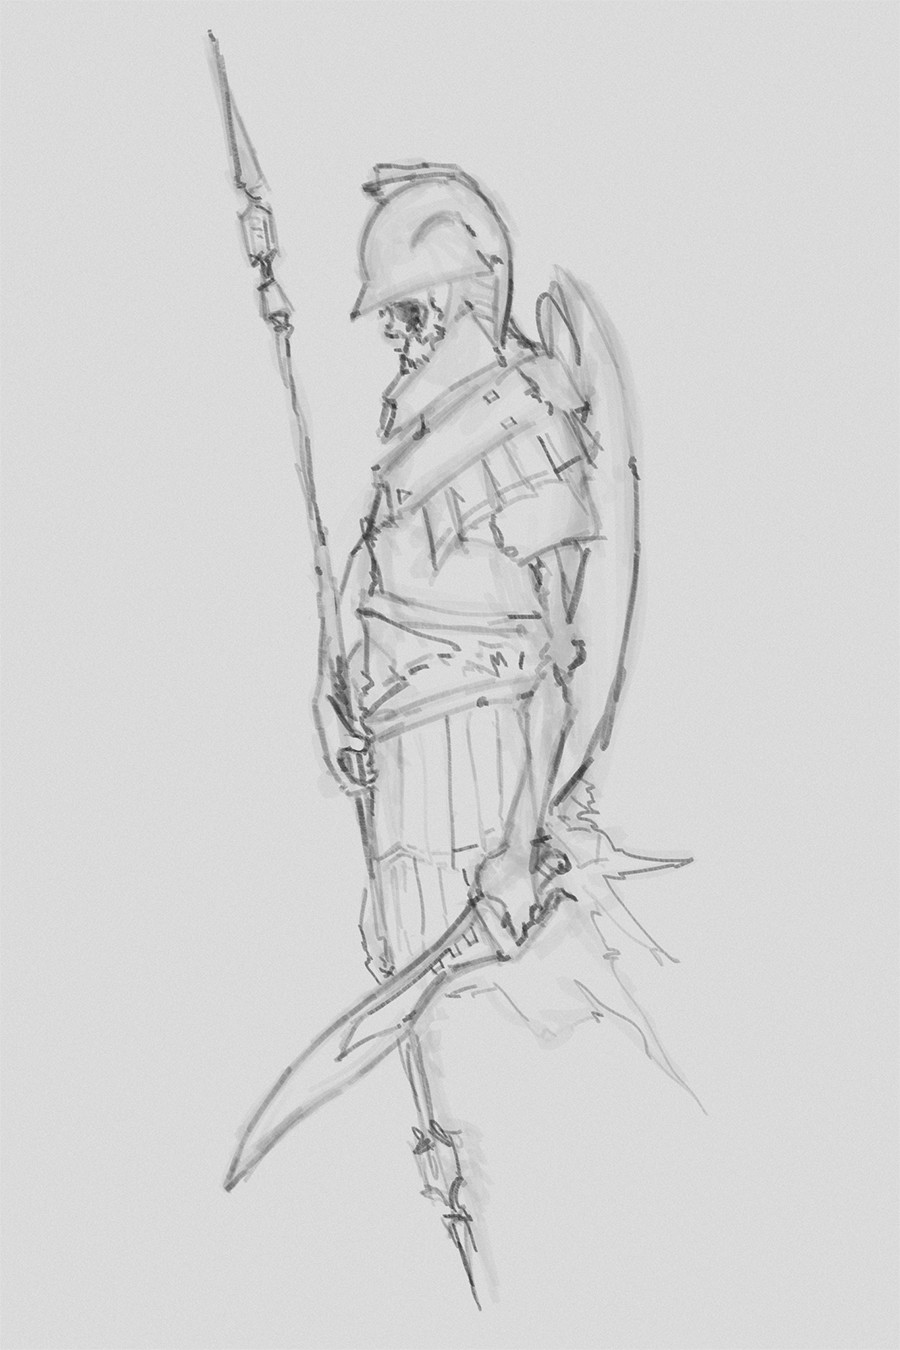 Procreate marker sketch